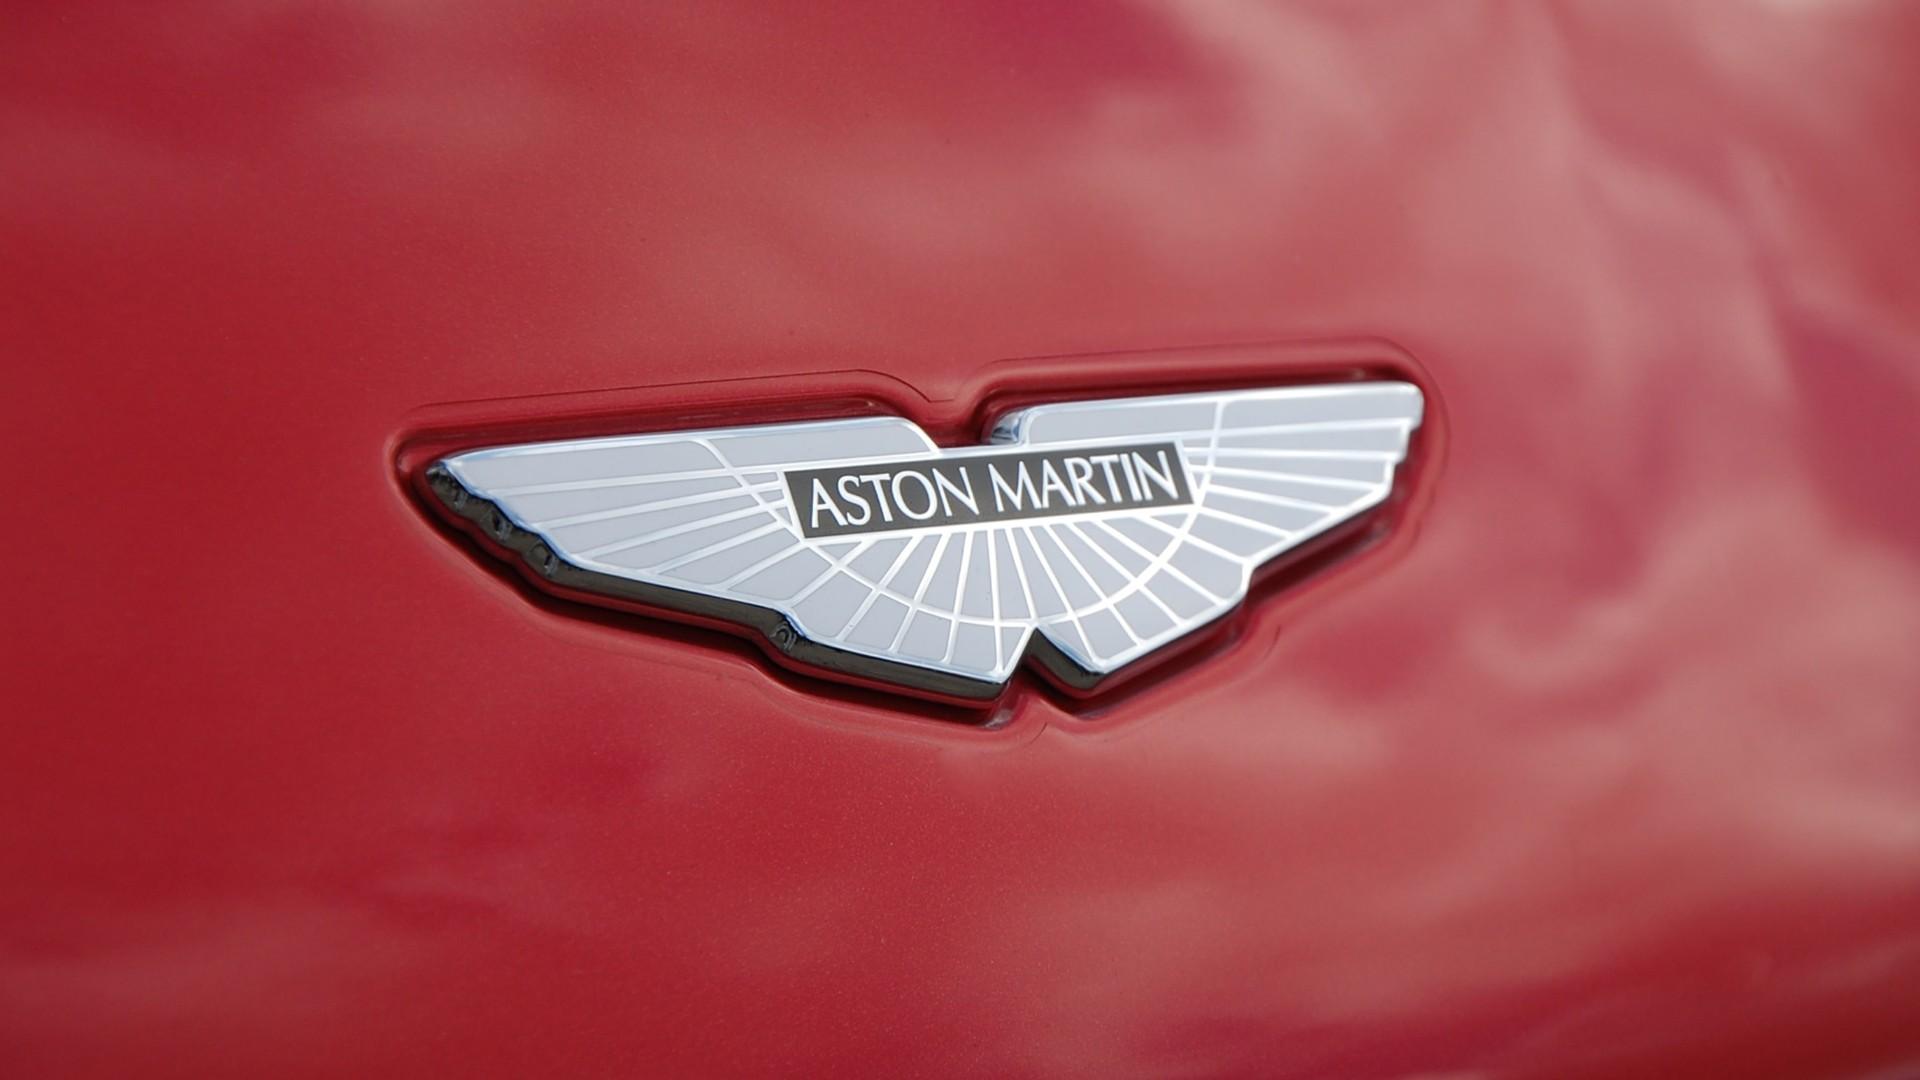 Aston Martin Dbx Car Insurance Keith Michaels Insurance